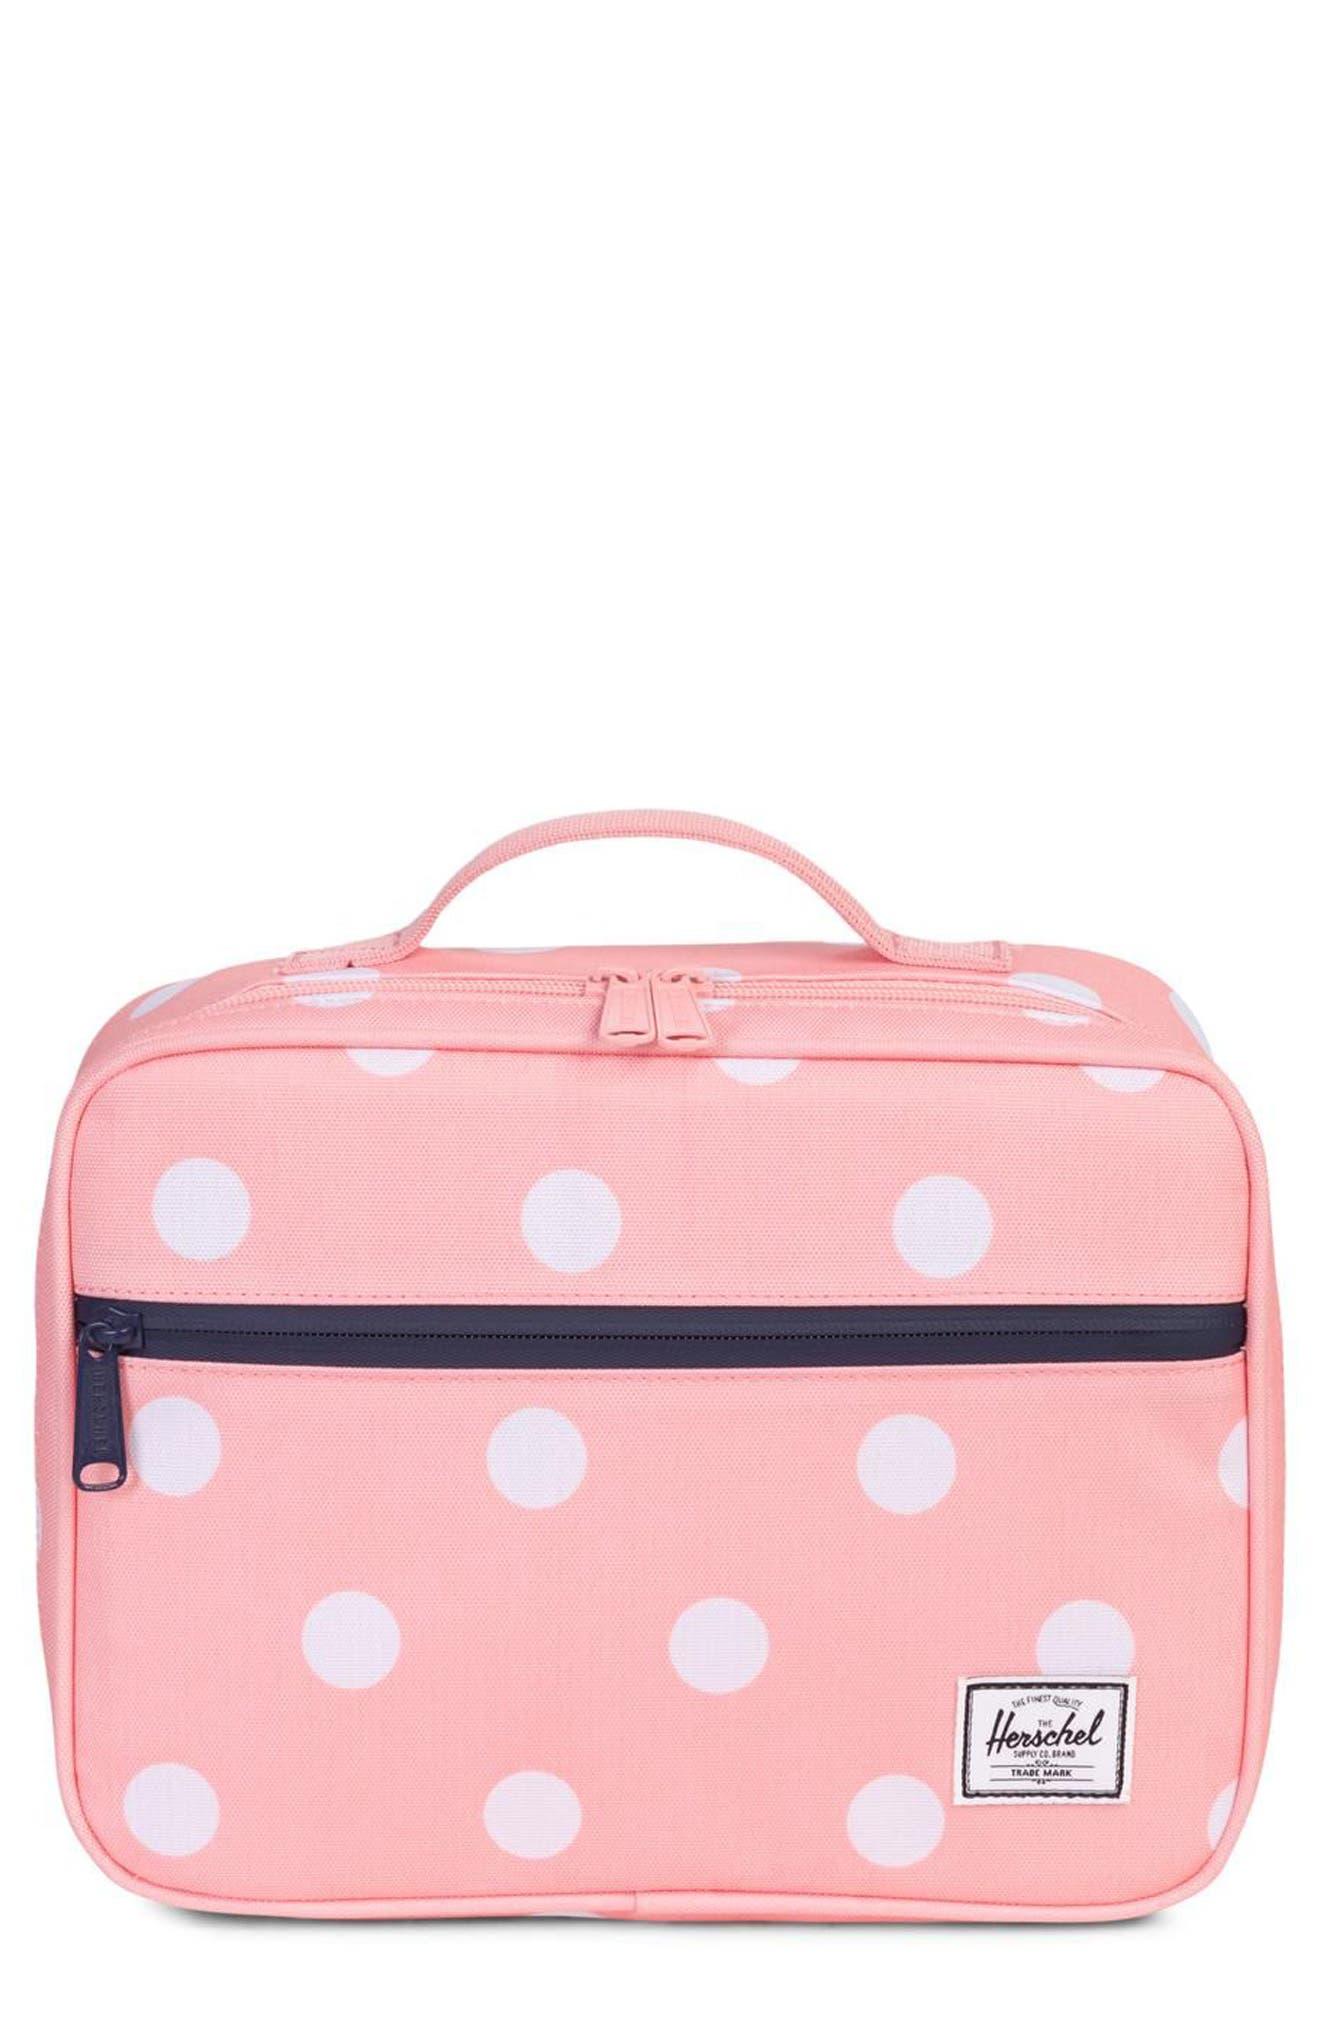 Pop Quiz Lunchbox,                         Main,                         color, Peach Polka Dot/ Peacoat